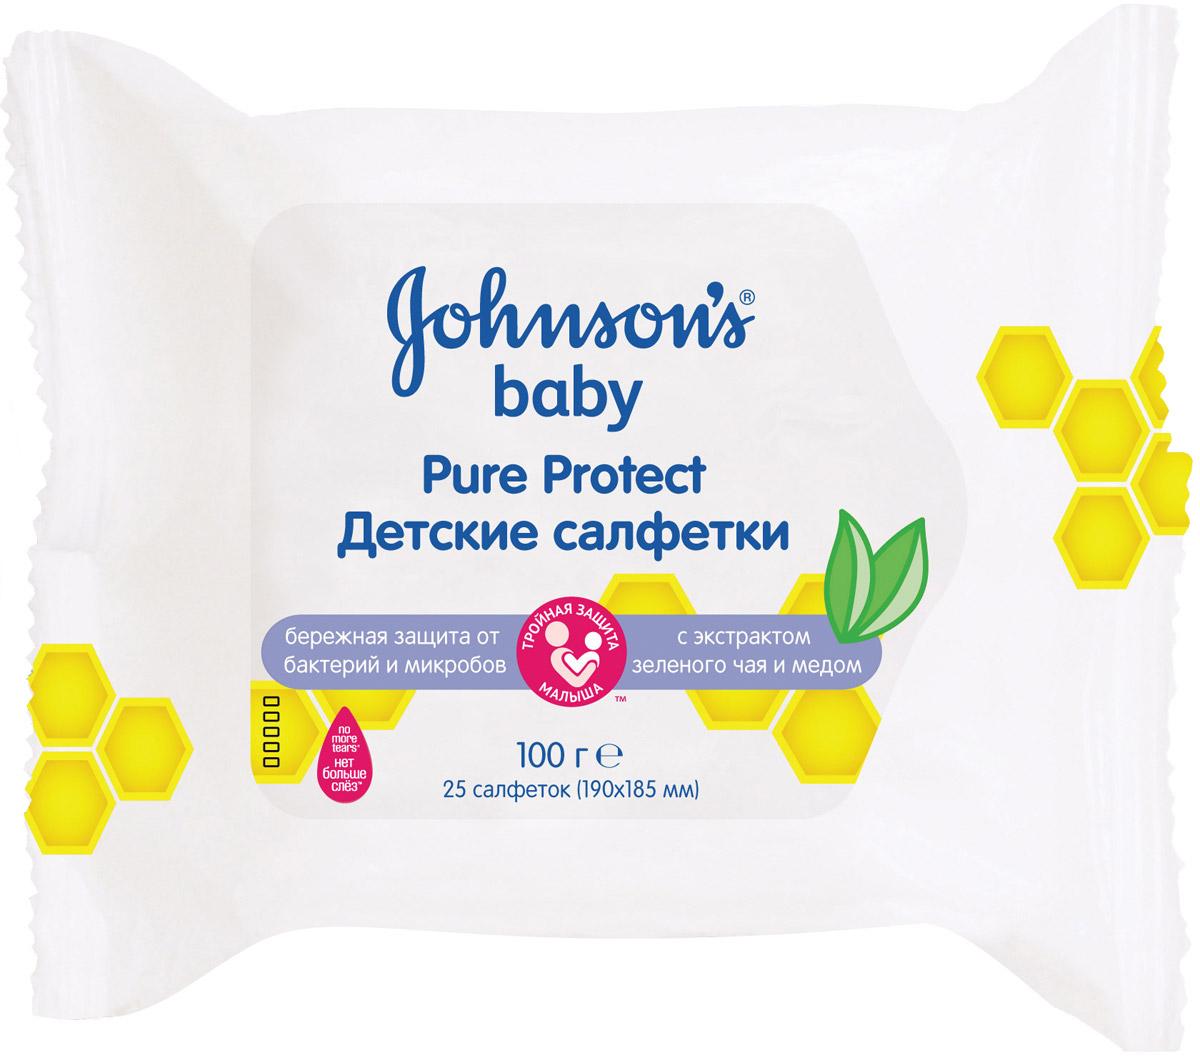 Johnson's baby Pure Protect Влажные салфетки 25 шт johnson s baby влажные салфетки для самых маленьких 128 шт подарок pure protect влажные салфетки детские 25 шт